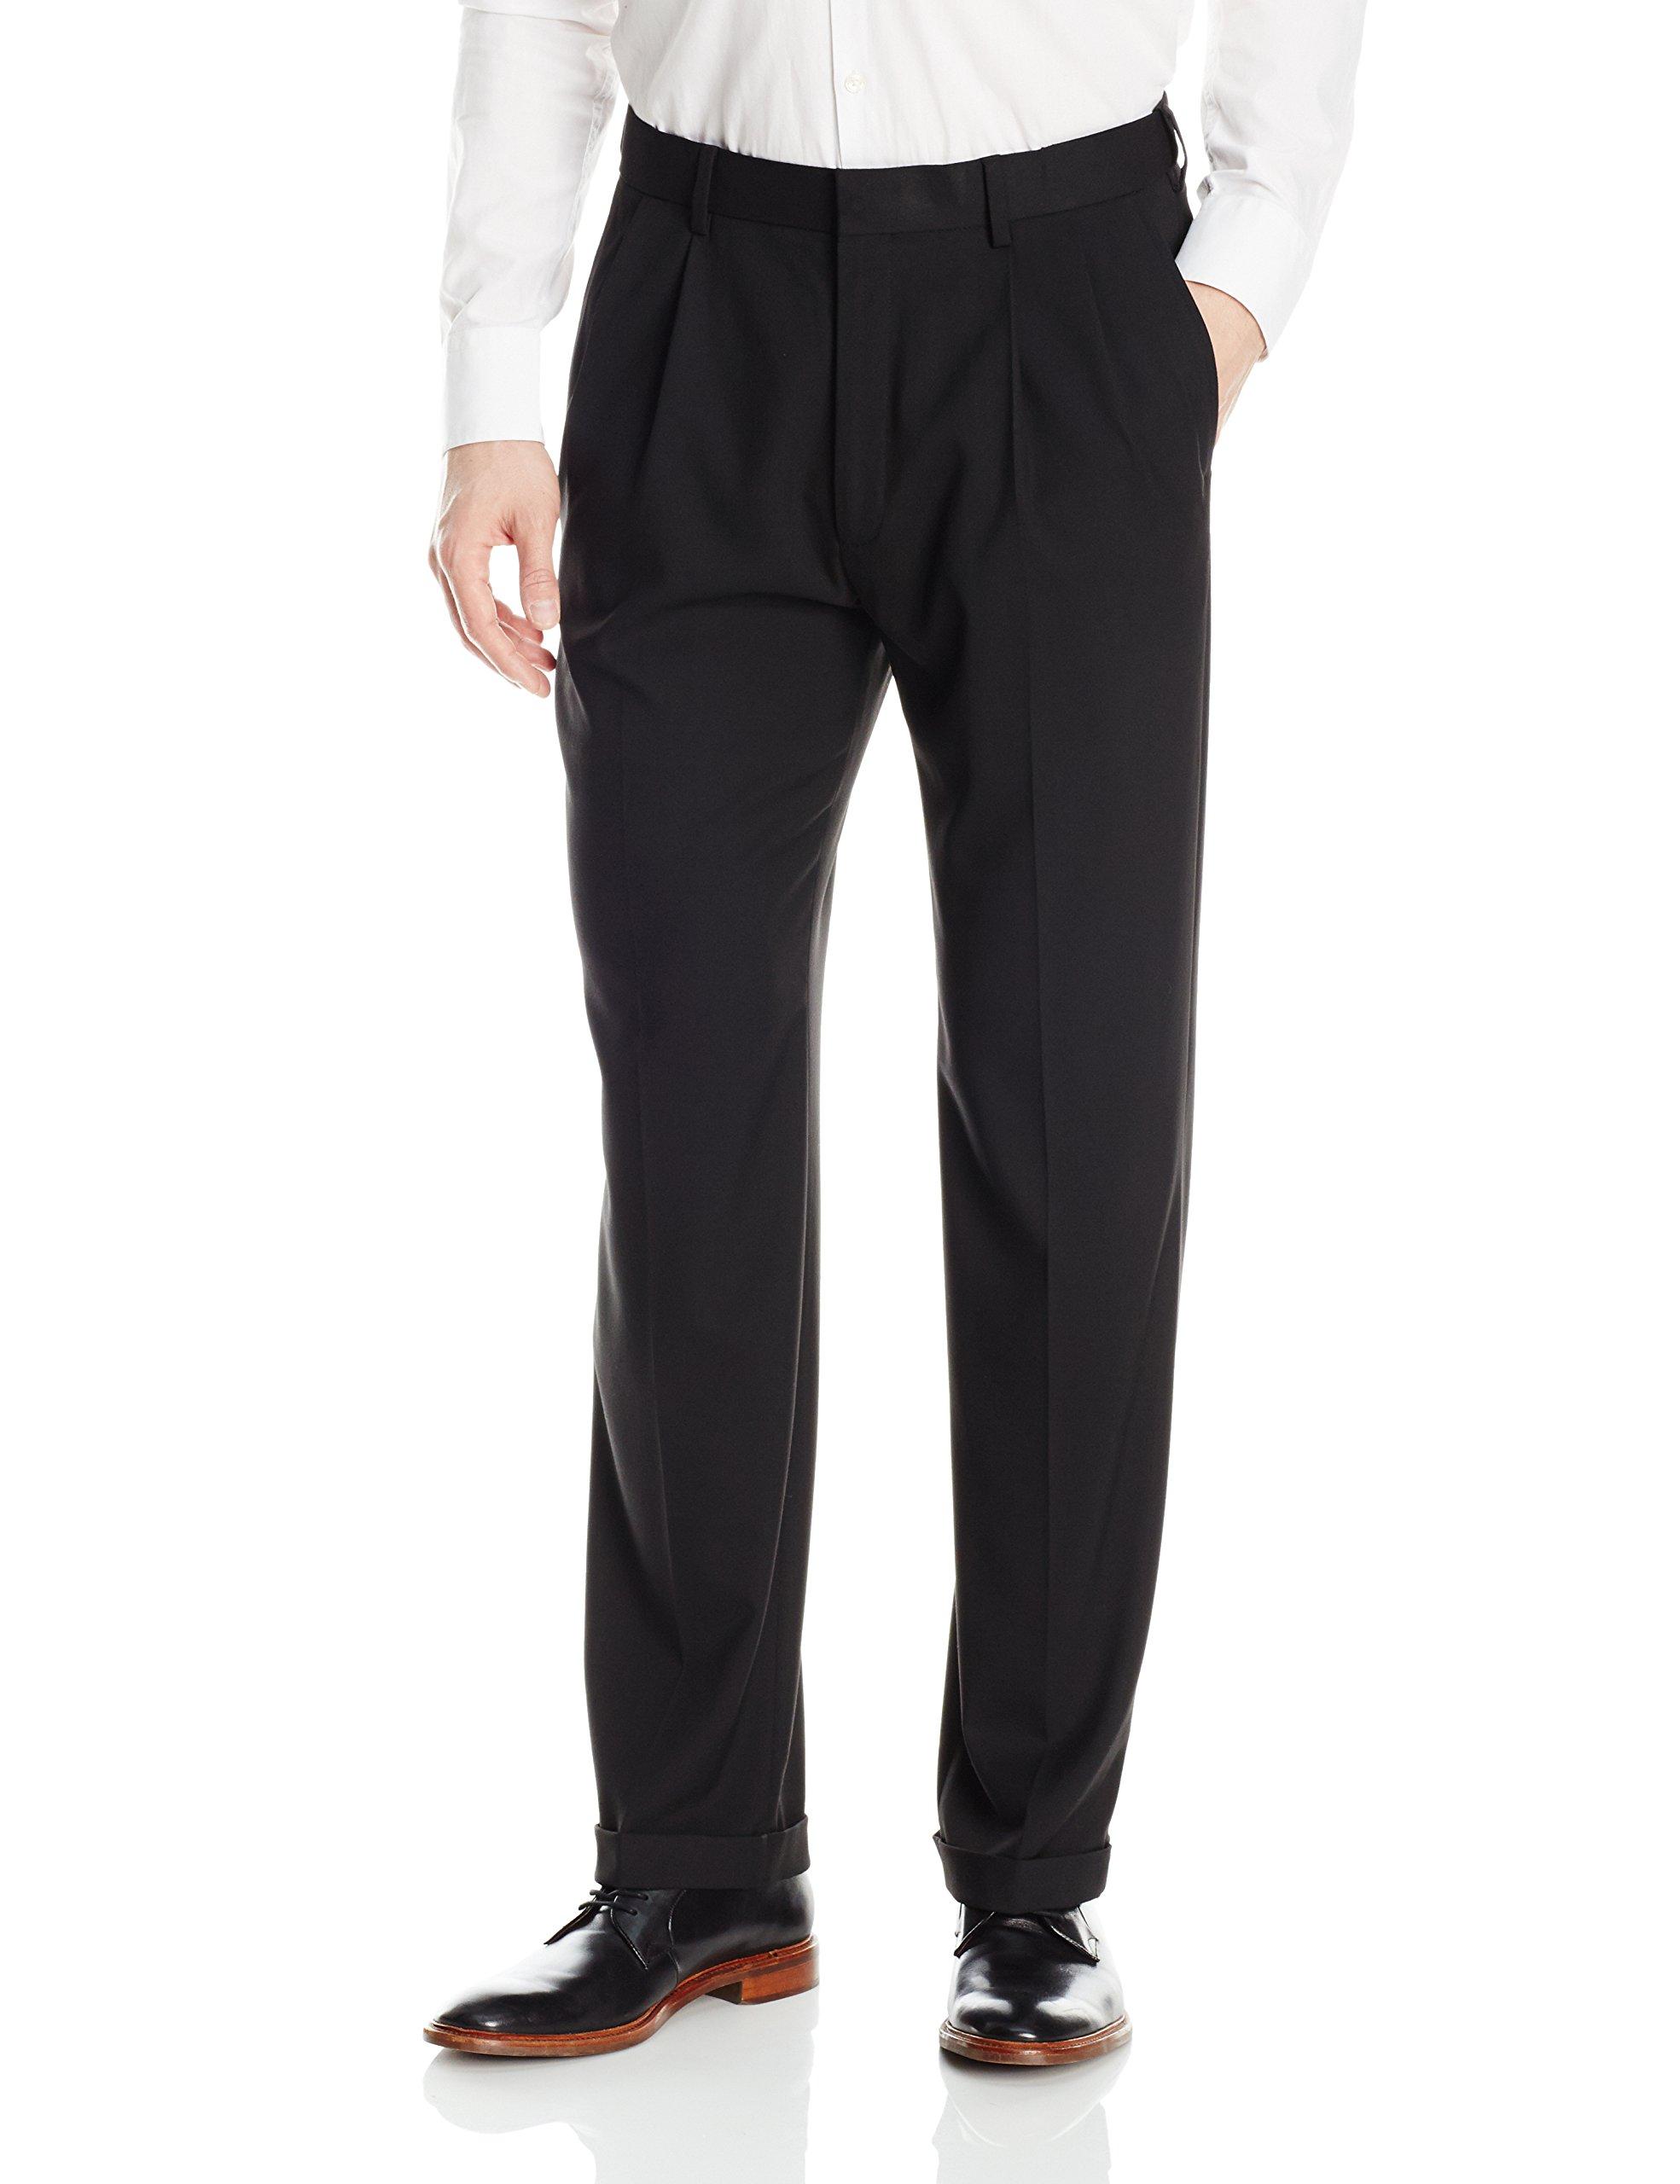 Haggar Men's J.m Premium Stretch Classic Fit Pleat Front Pant, Black, 42Wx30L by J.M. Haggar